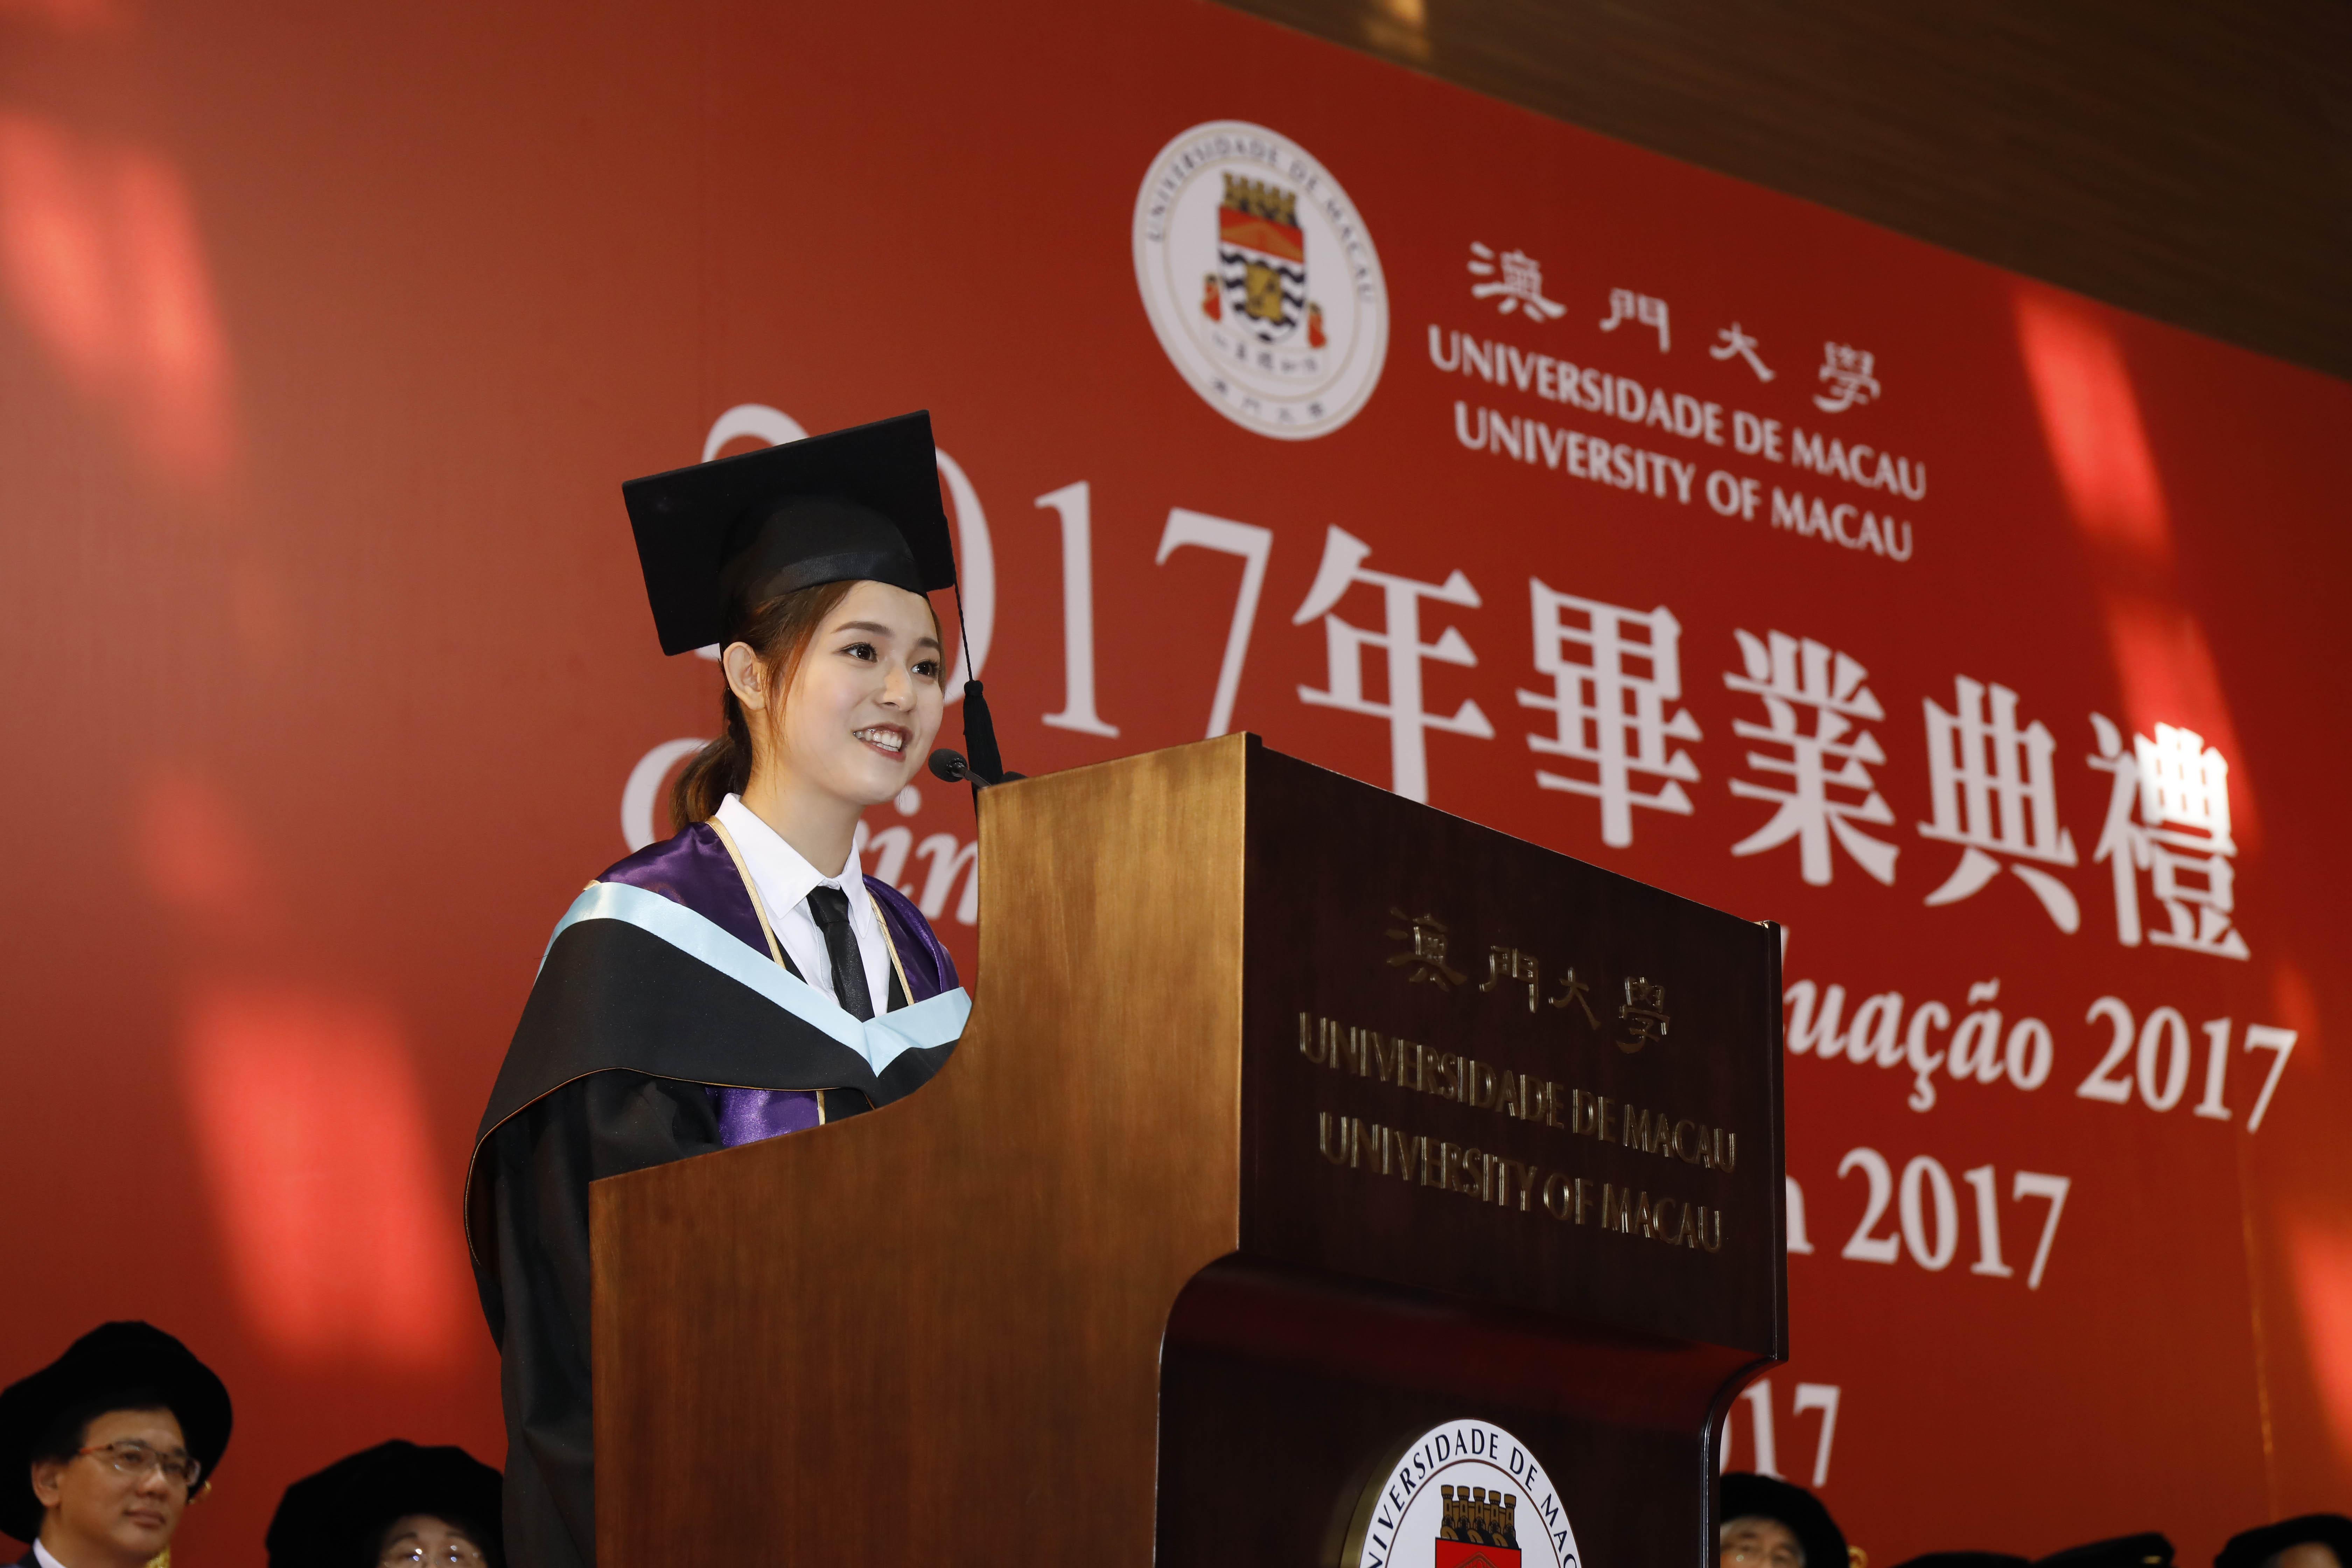 The representative of the graduates